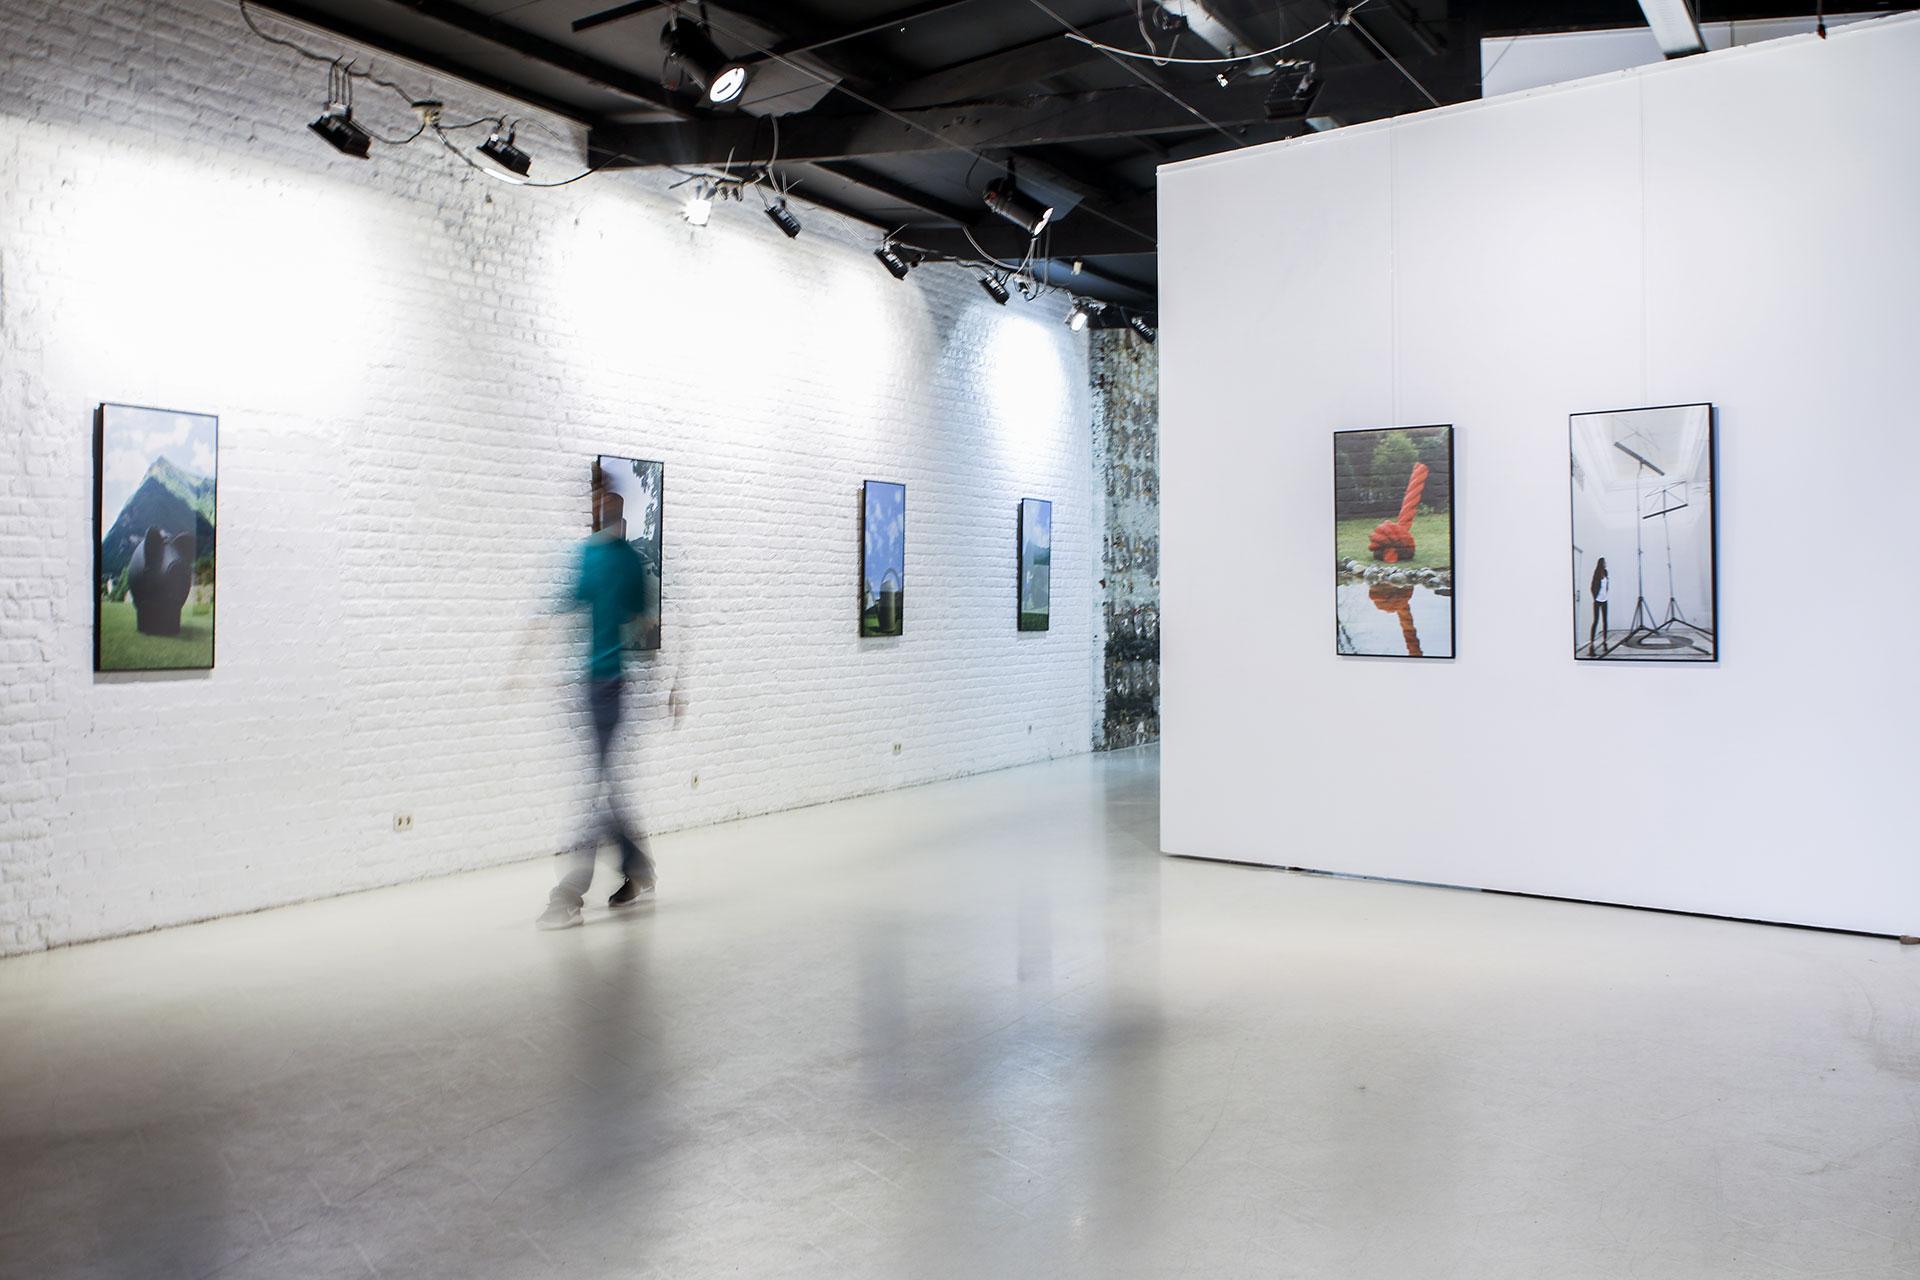 Galerie - Beffroi - Namur - Lilian Bourgeat